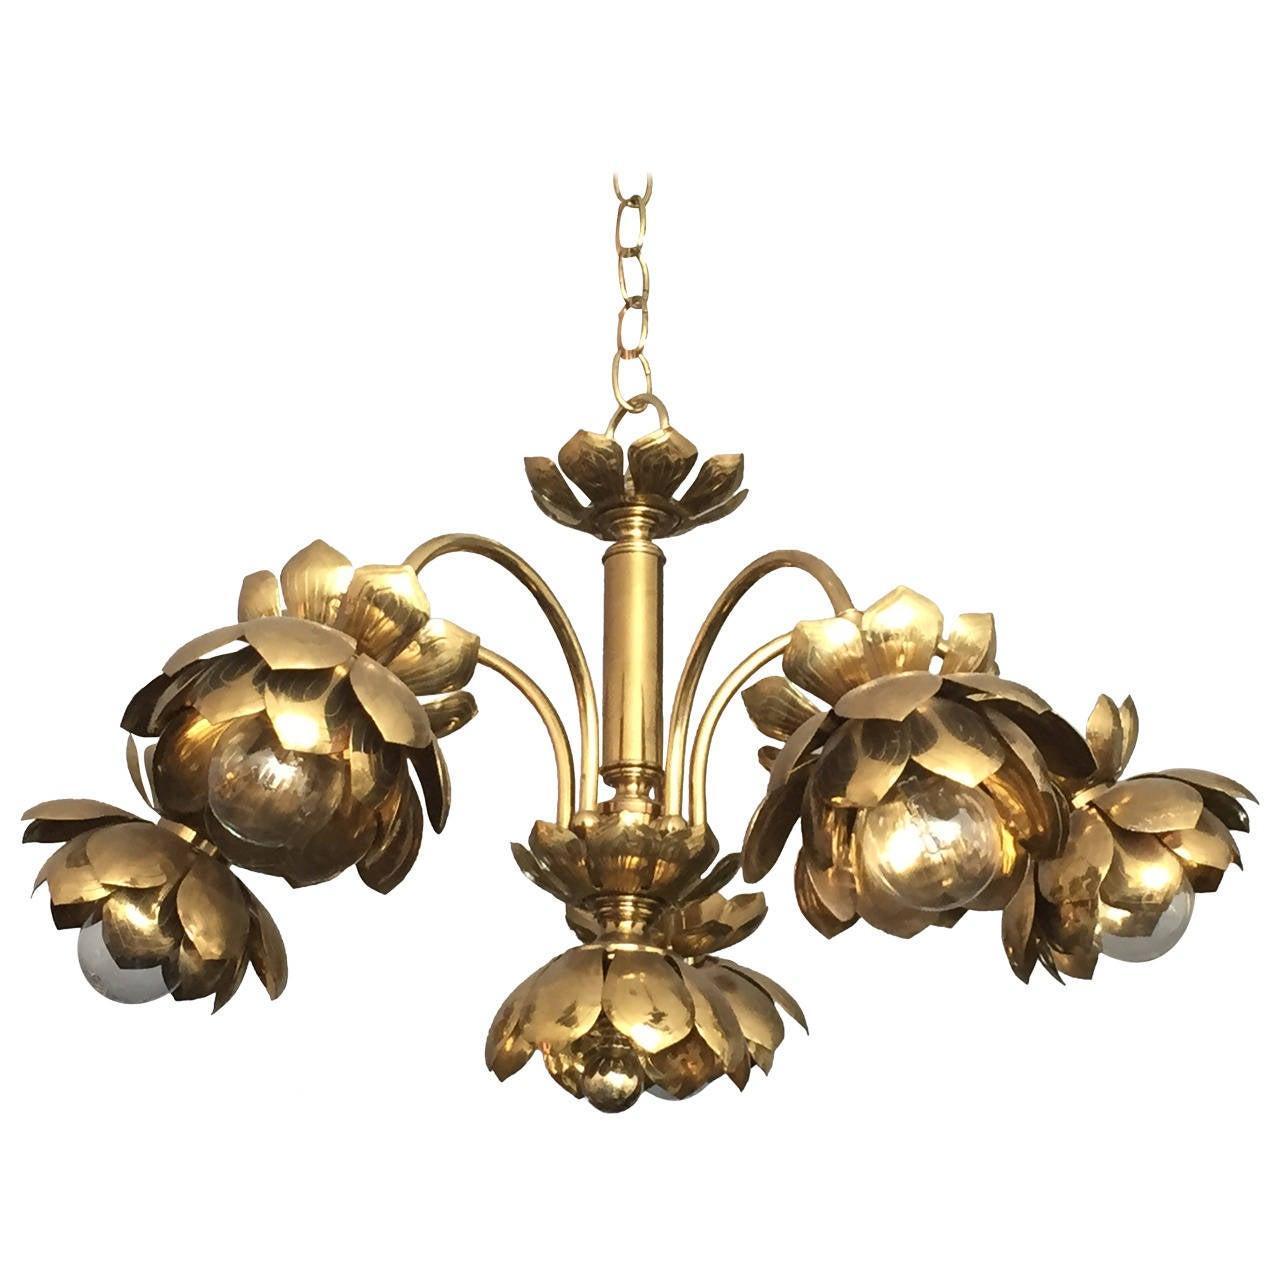 lotus en and fruits rezzonico glass chandelier chandeliers murano flowers